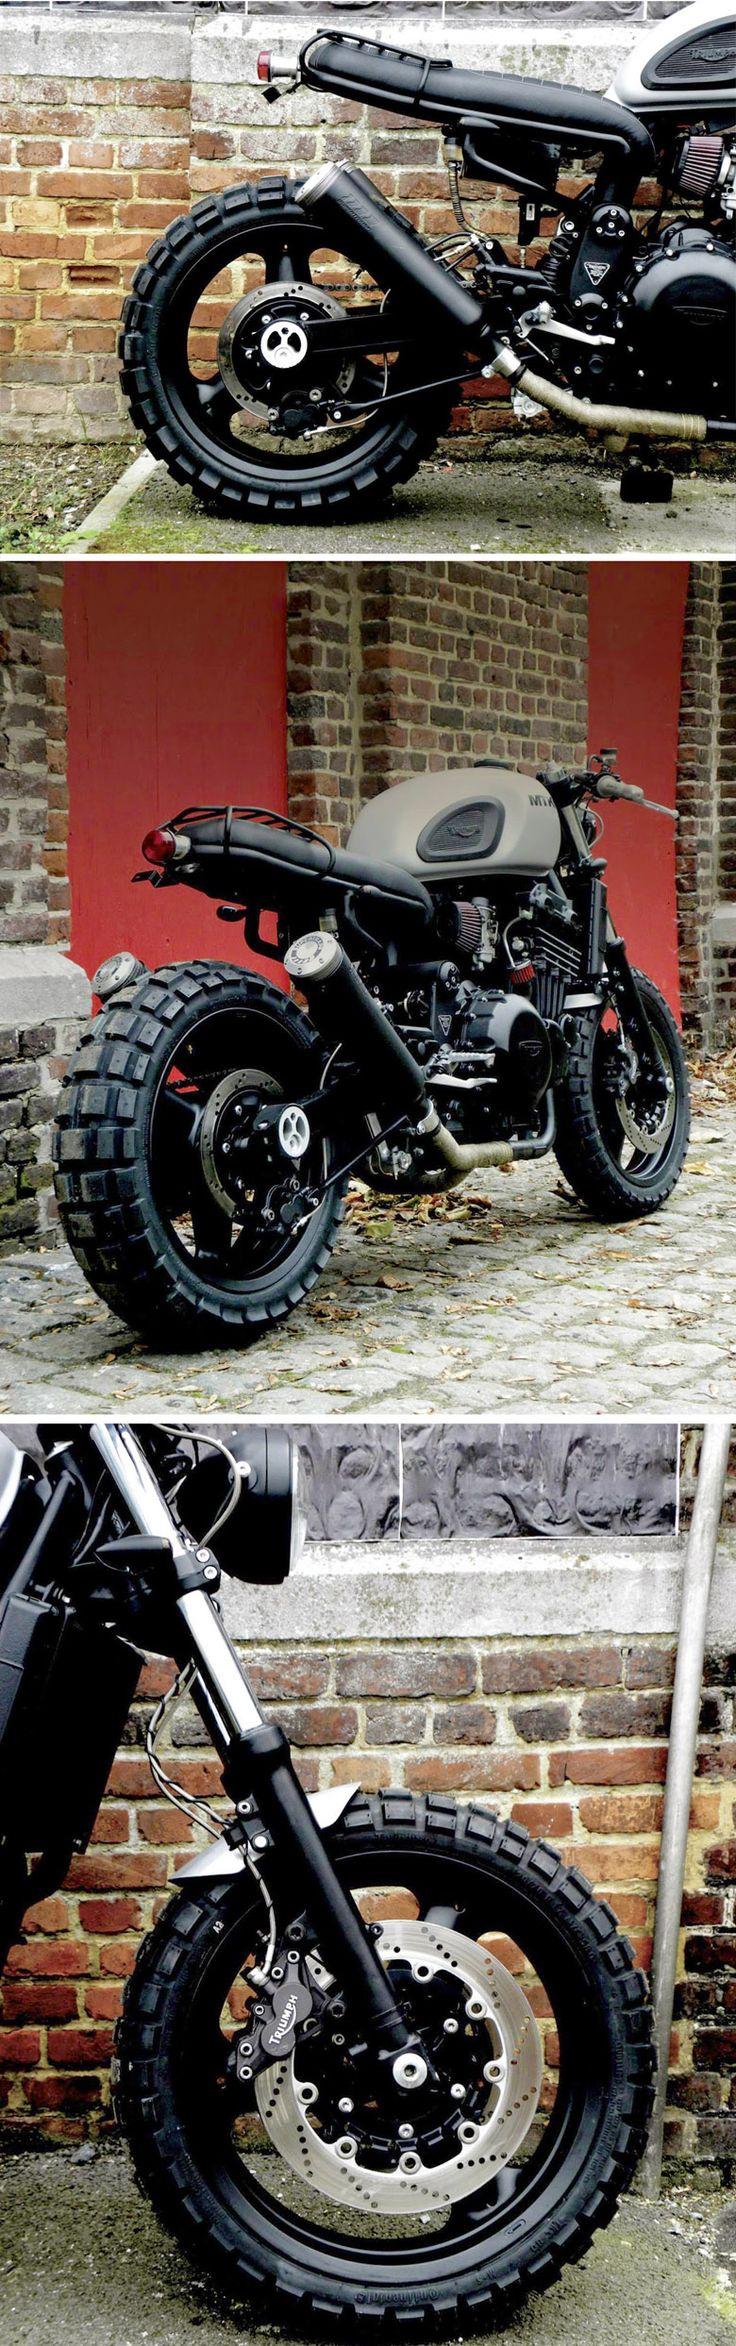 MK20 - Triumph by MotoKouture Bespoke Motorcycles.  |   http://rocket-garage.blogspot.ca/2014/10/mk20-mtkn.html